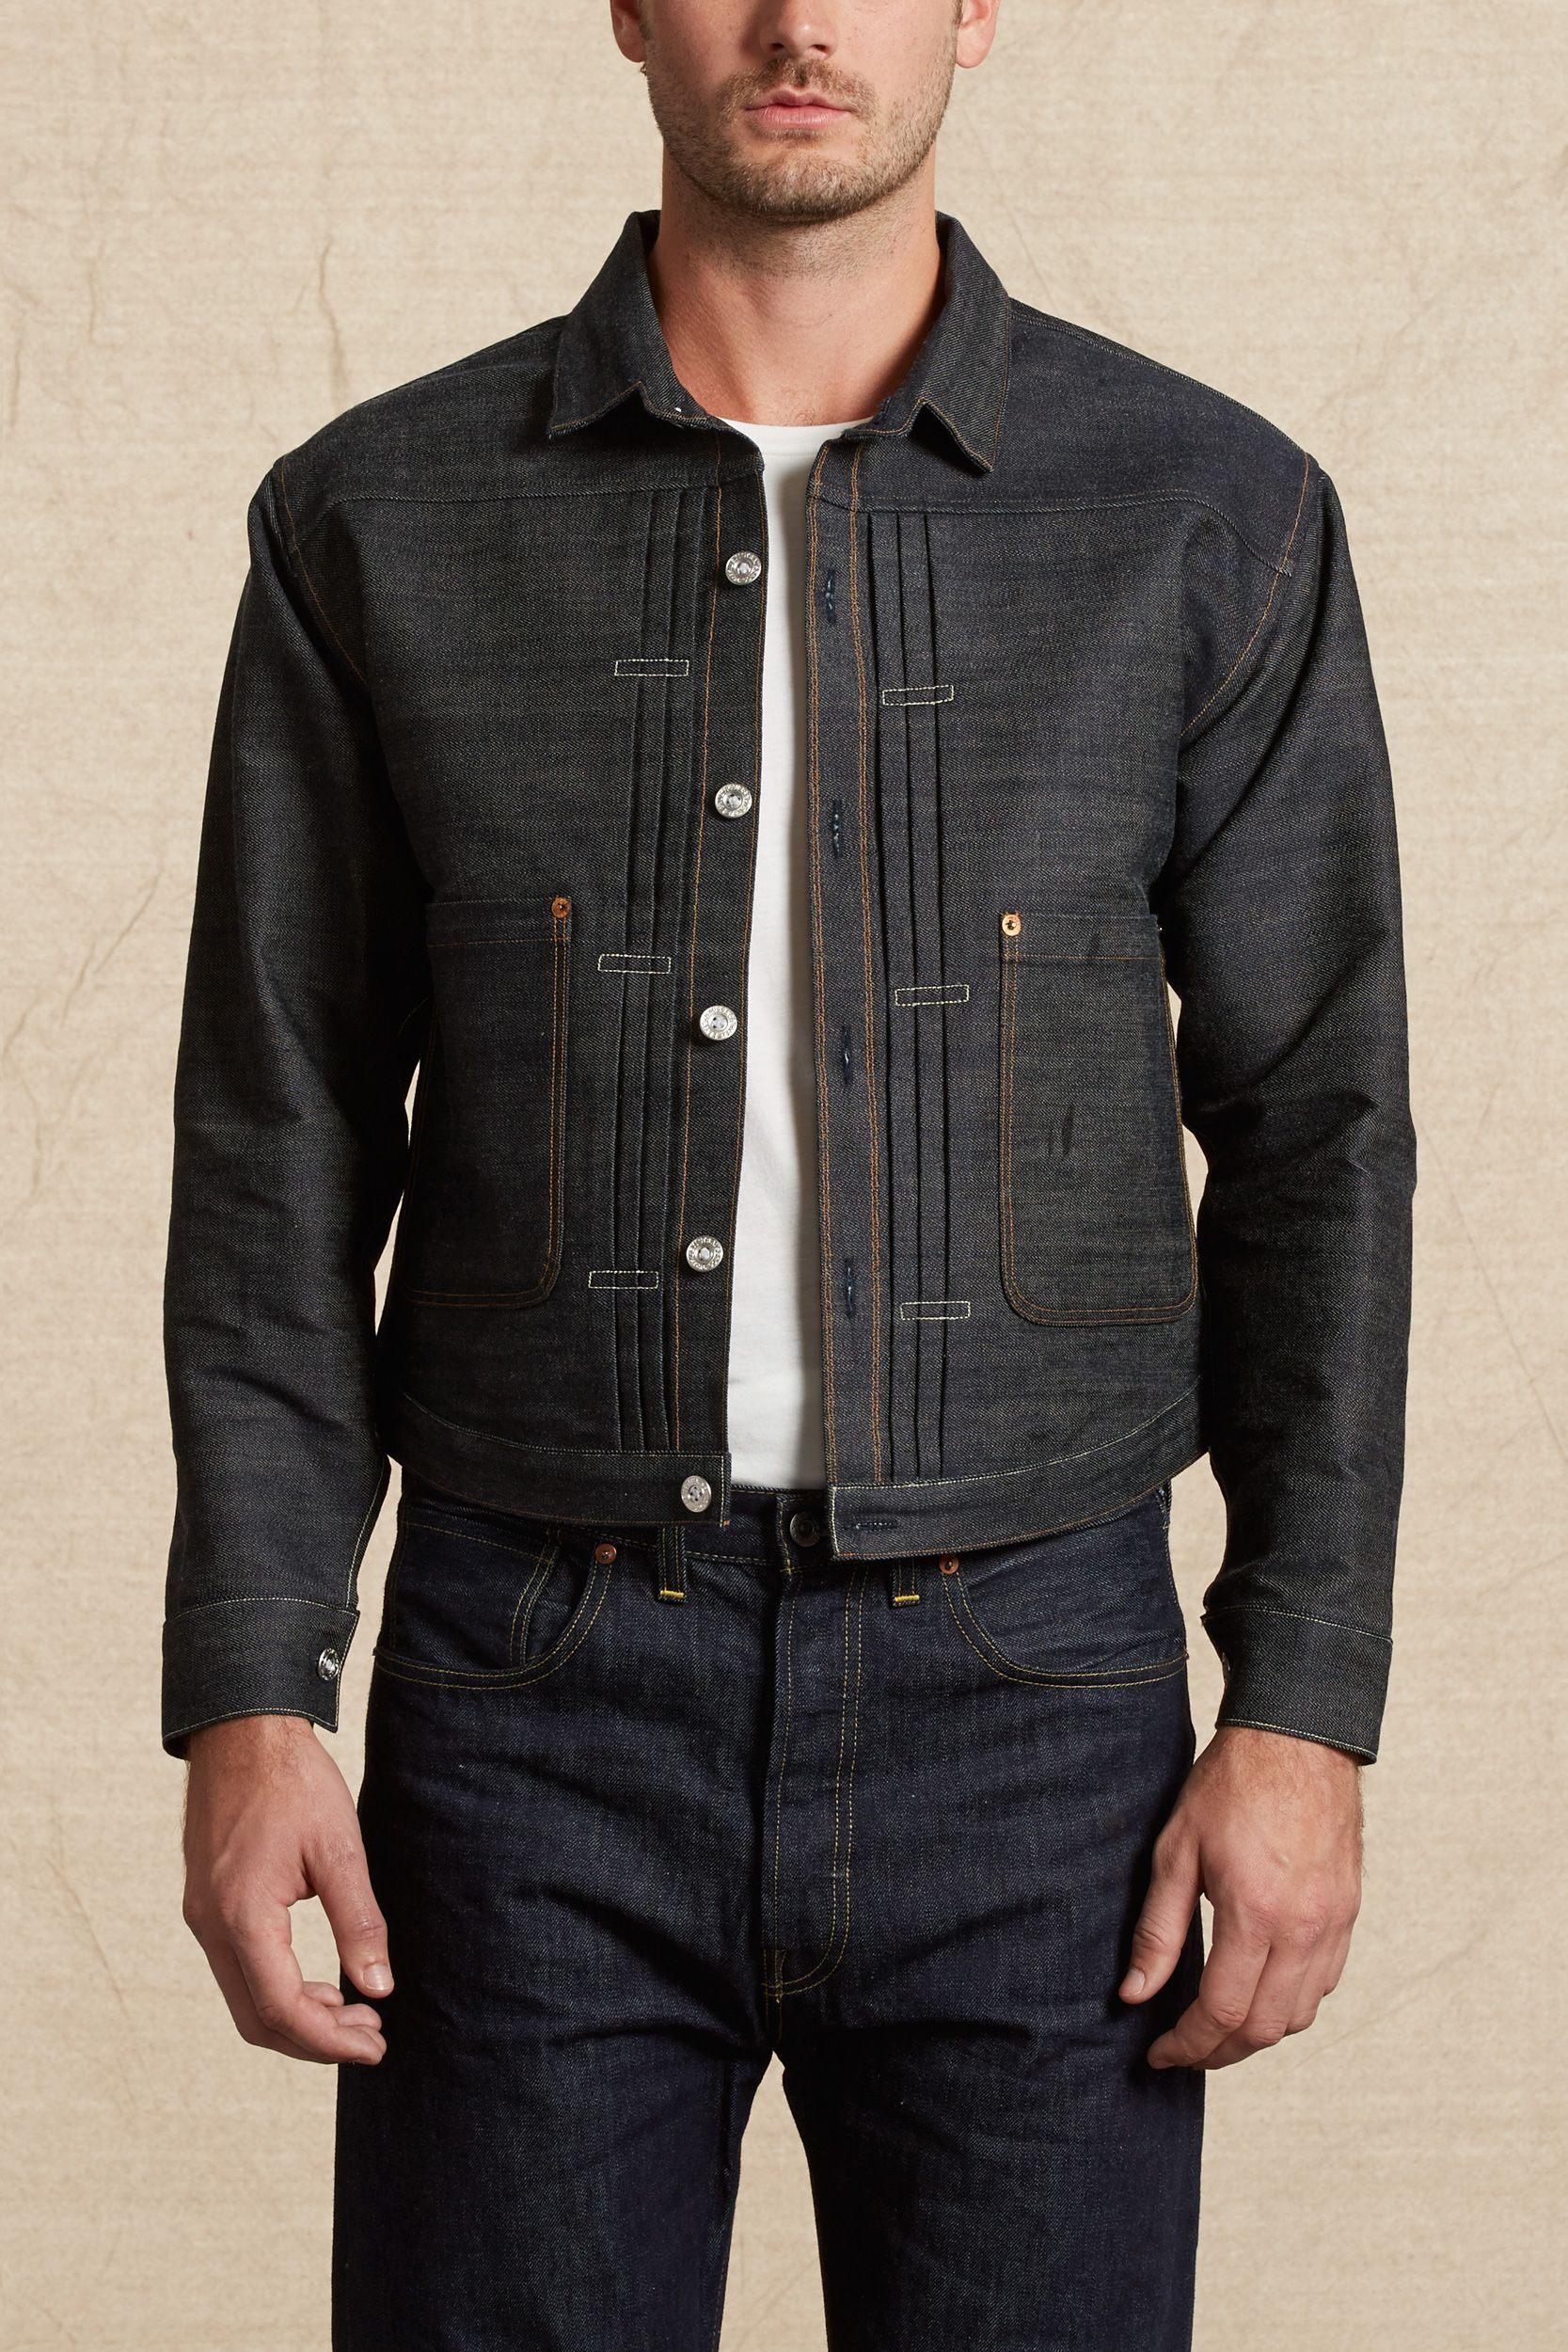 Triple Pleat Blouse Vintage Clothing Men Leather Jacket Men Style Jackets Men Fashion